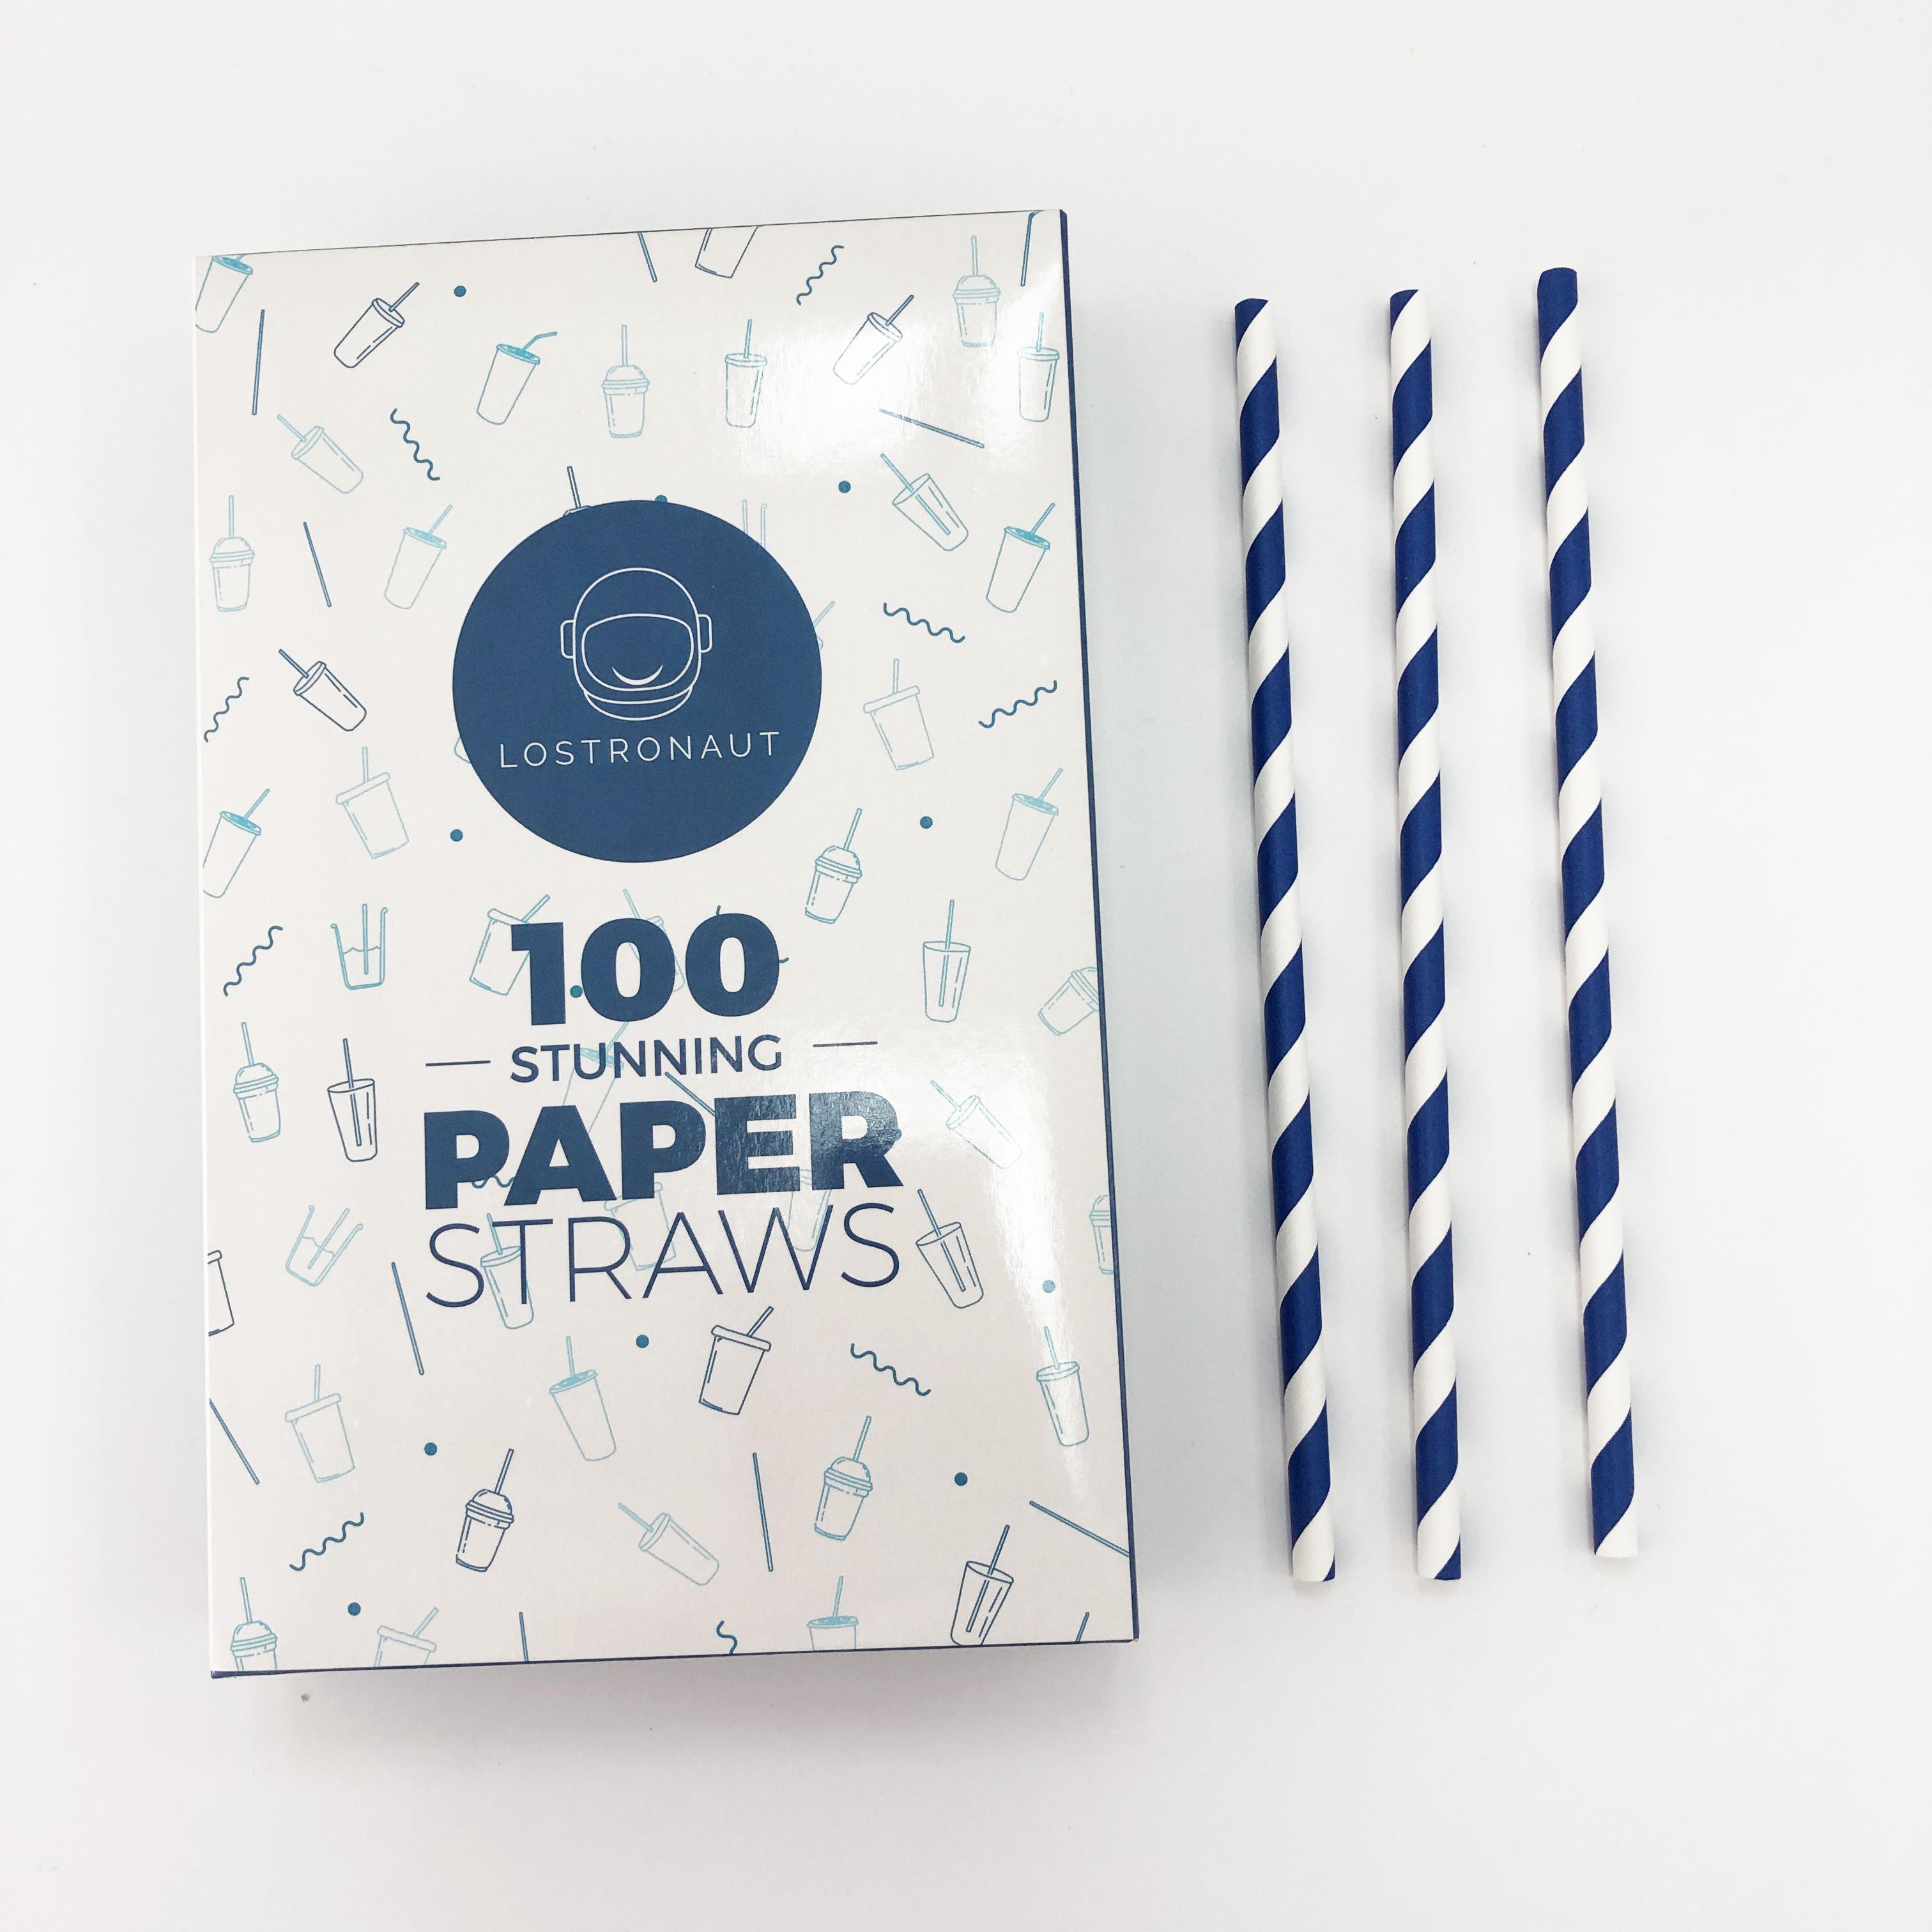 Eco amigable reciclable reutilizable Venta caliente azul marino a rayas envuelto desechable biodegradable de paja de papel